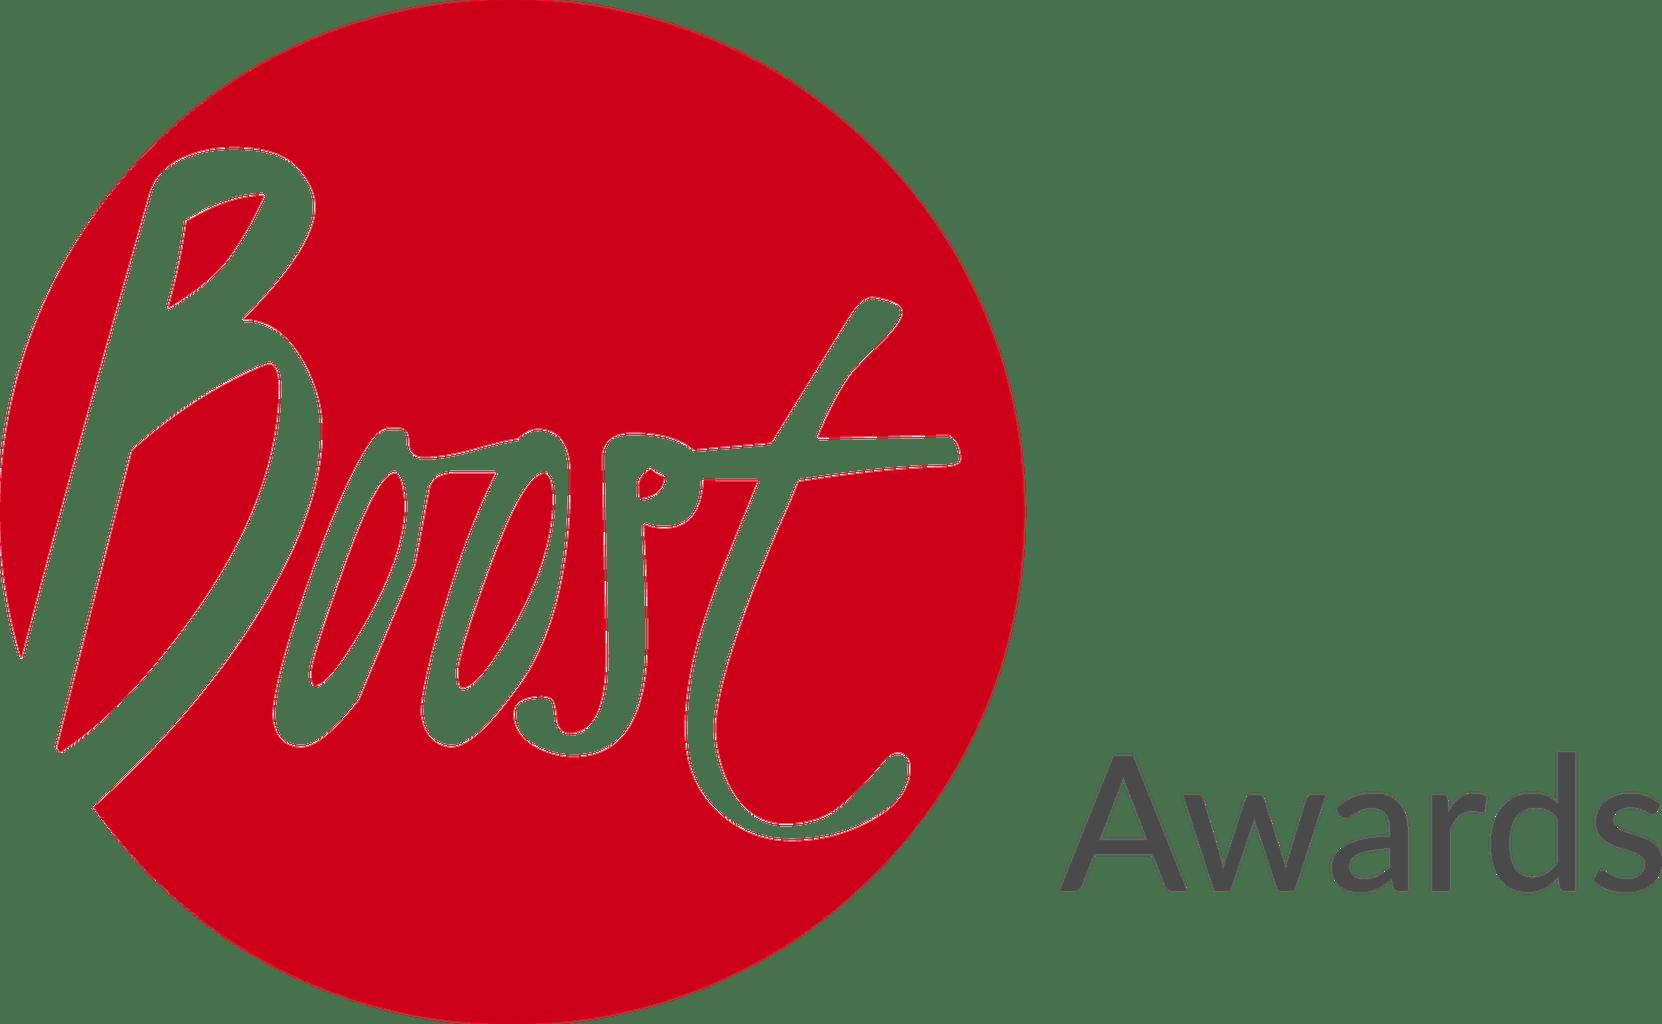 Boost Awards